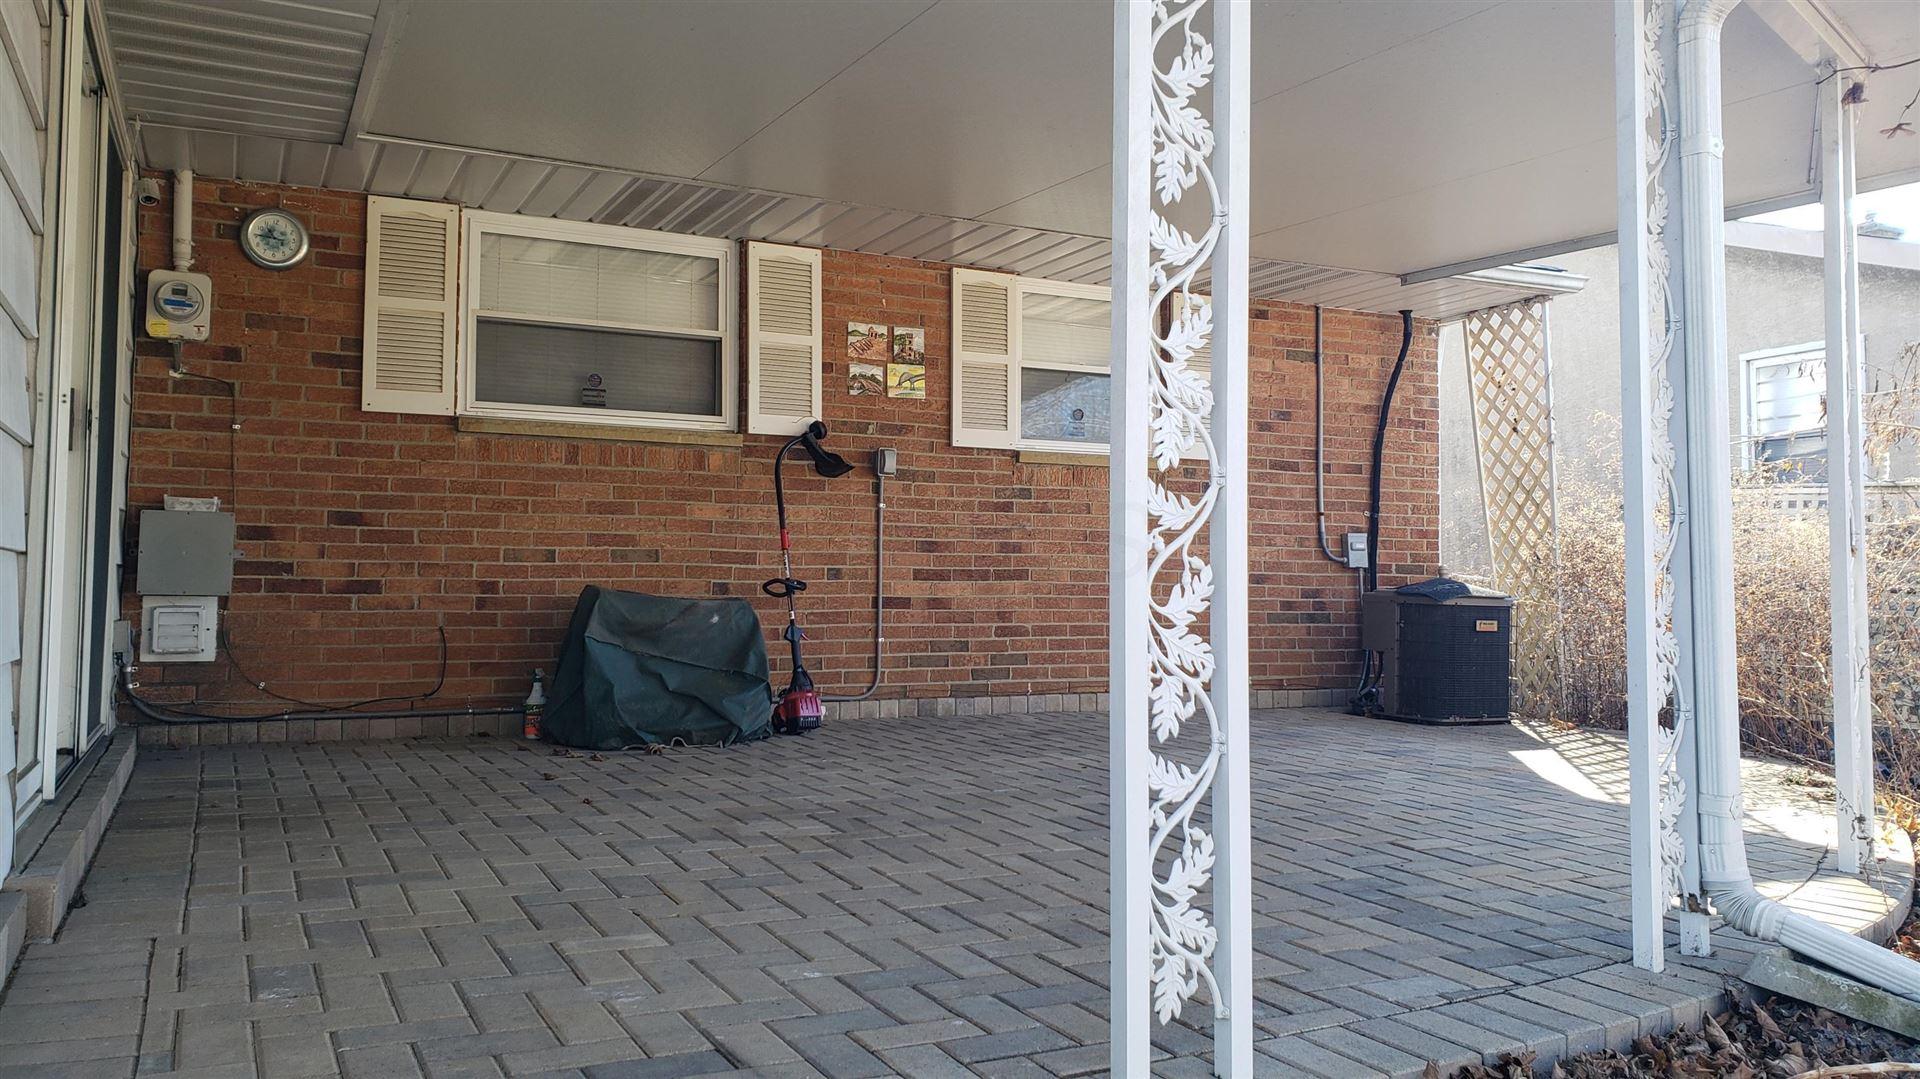 Photo of 1205 Arkwood Avenue, Columbus, OH 43227 (MLS # 221006015)